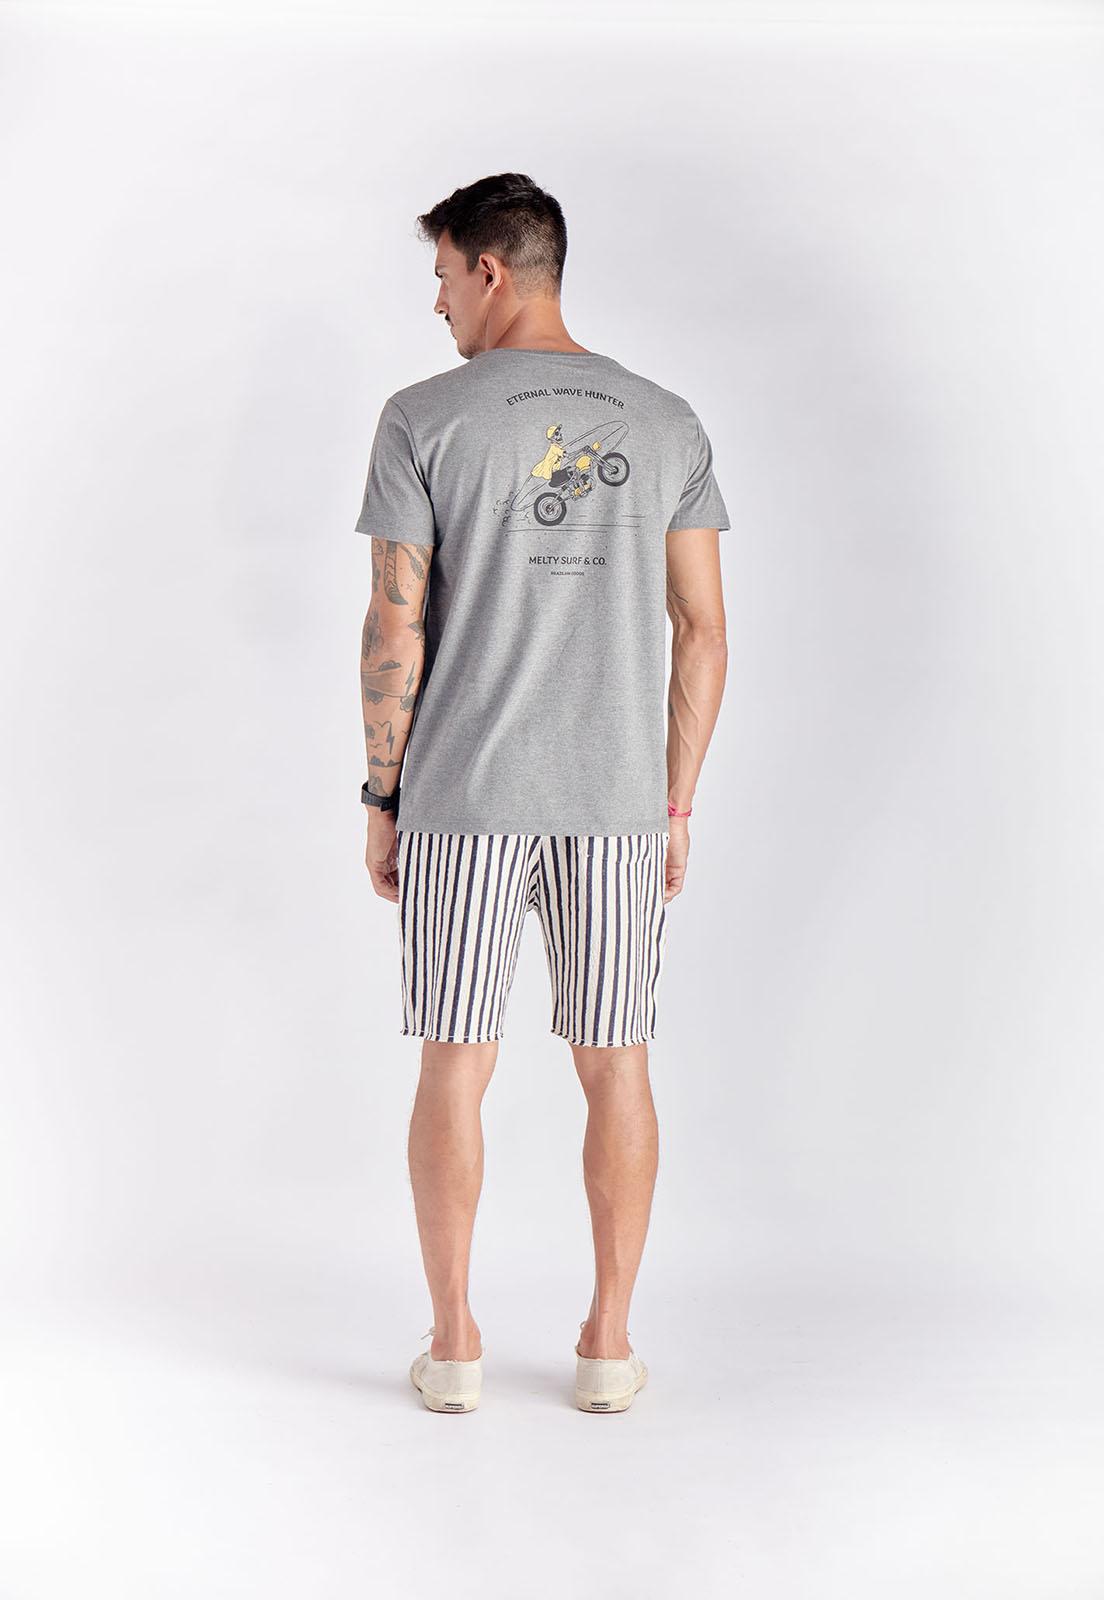 T-shirt Wave Hunter Mescla Melty  - melty surf & Co.